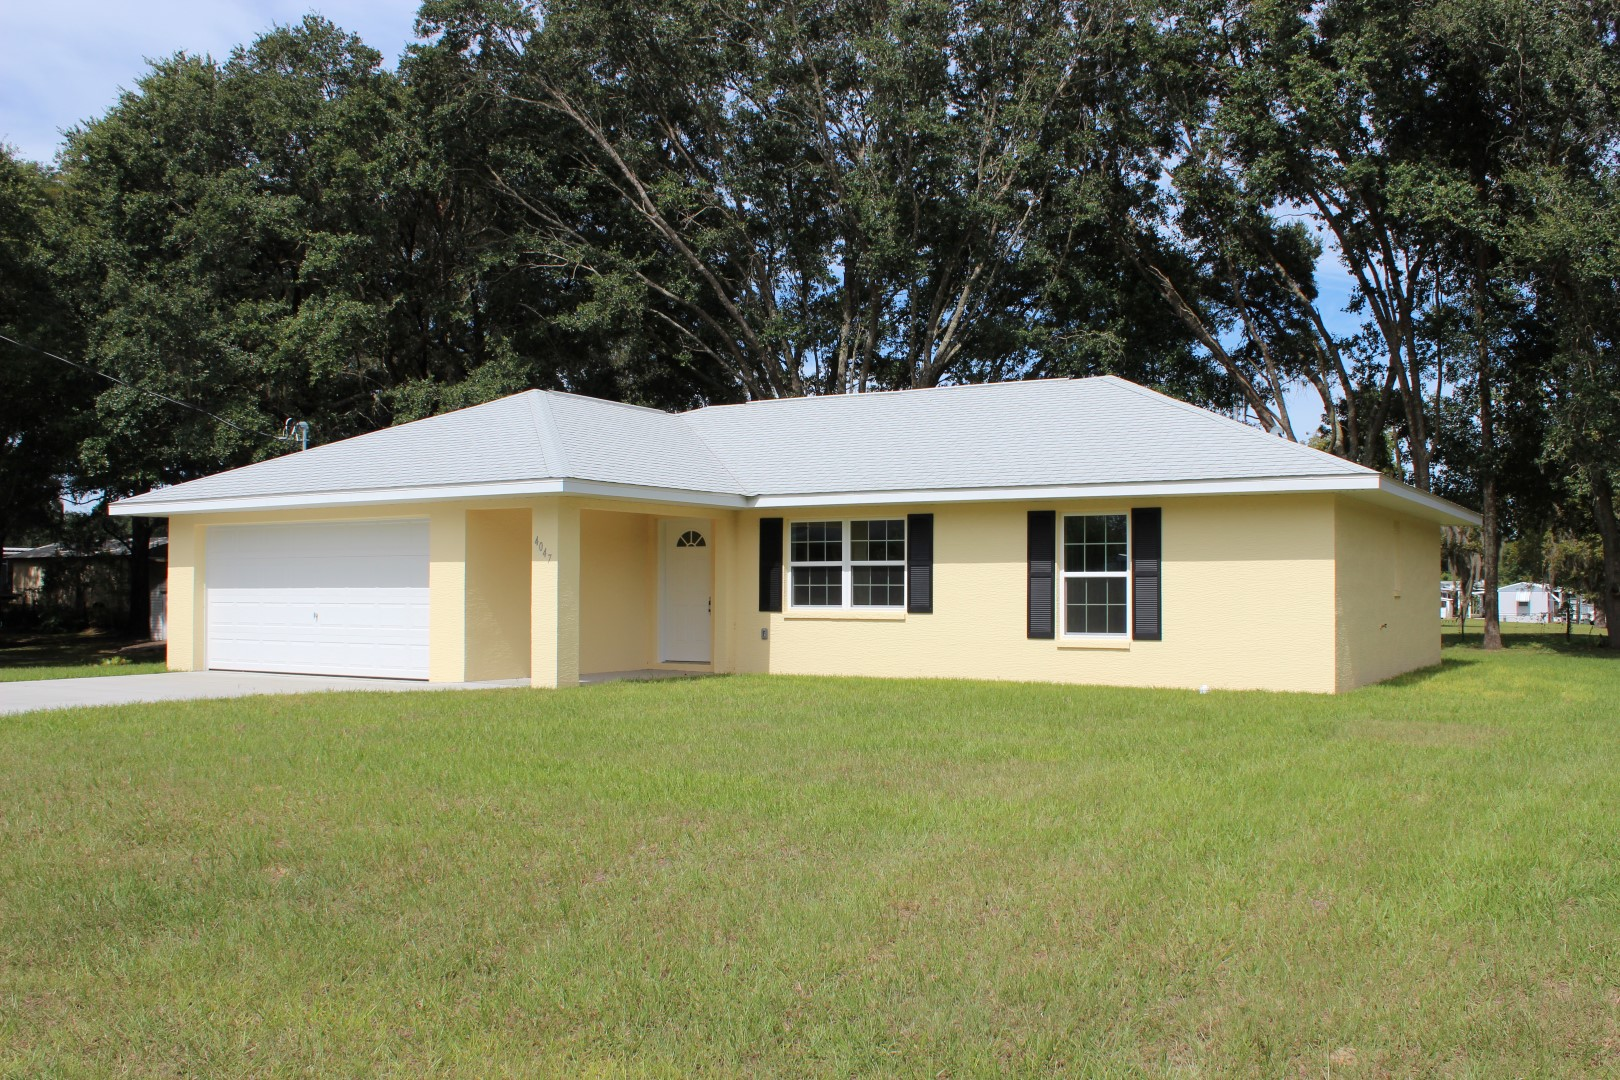 4047 Berry, Inverness, Florida 34453